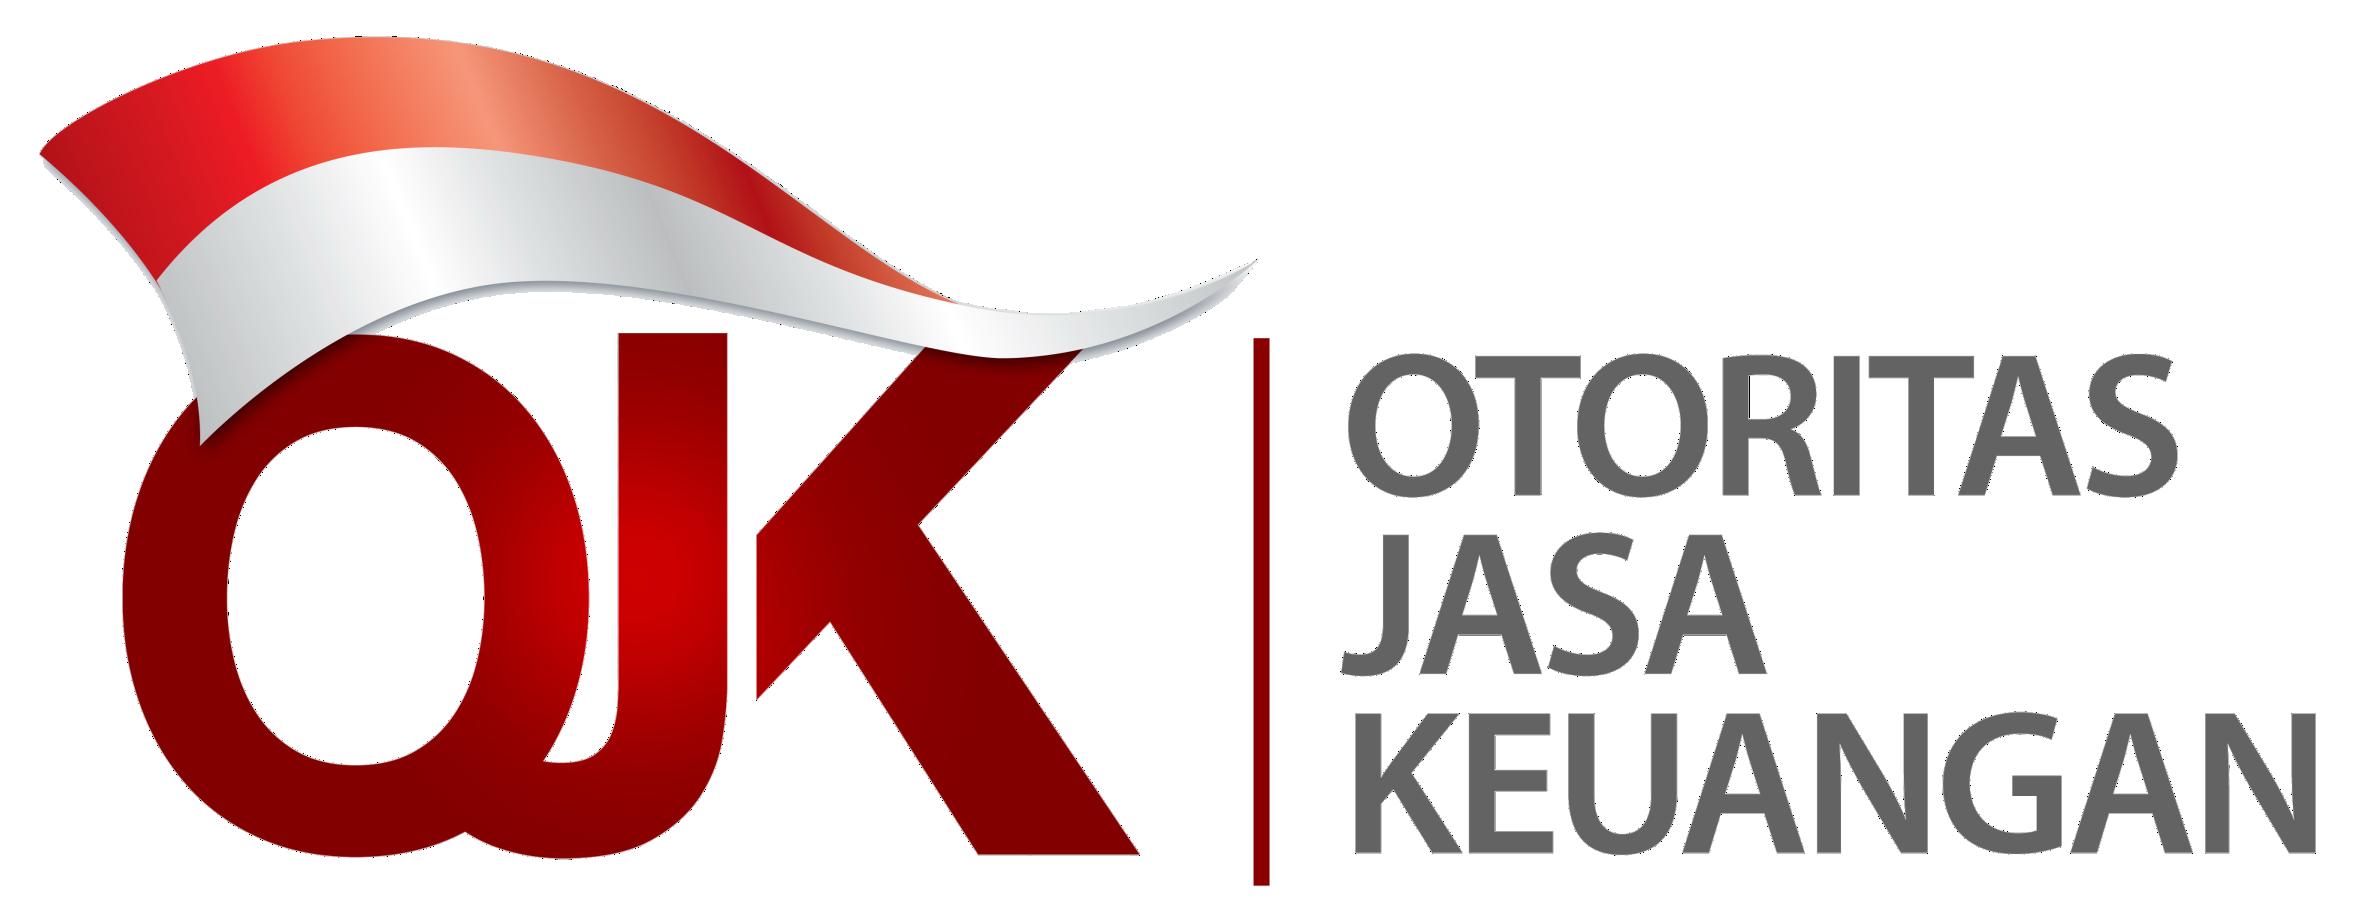 OJK: Stabilitas sektor jasa keuangan masih stabil hingga Agustus